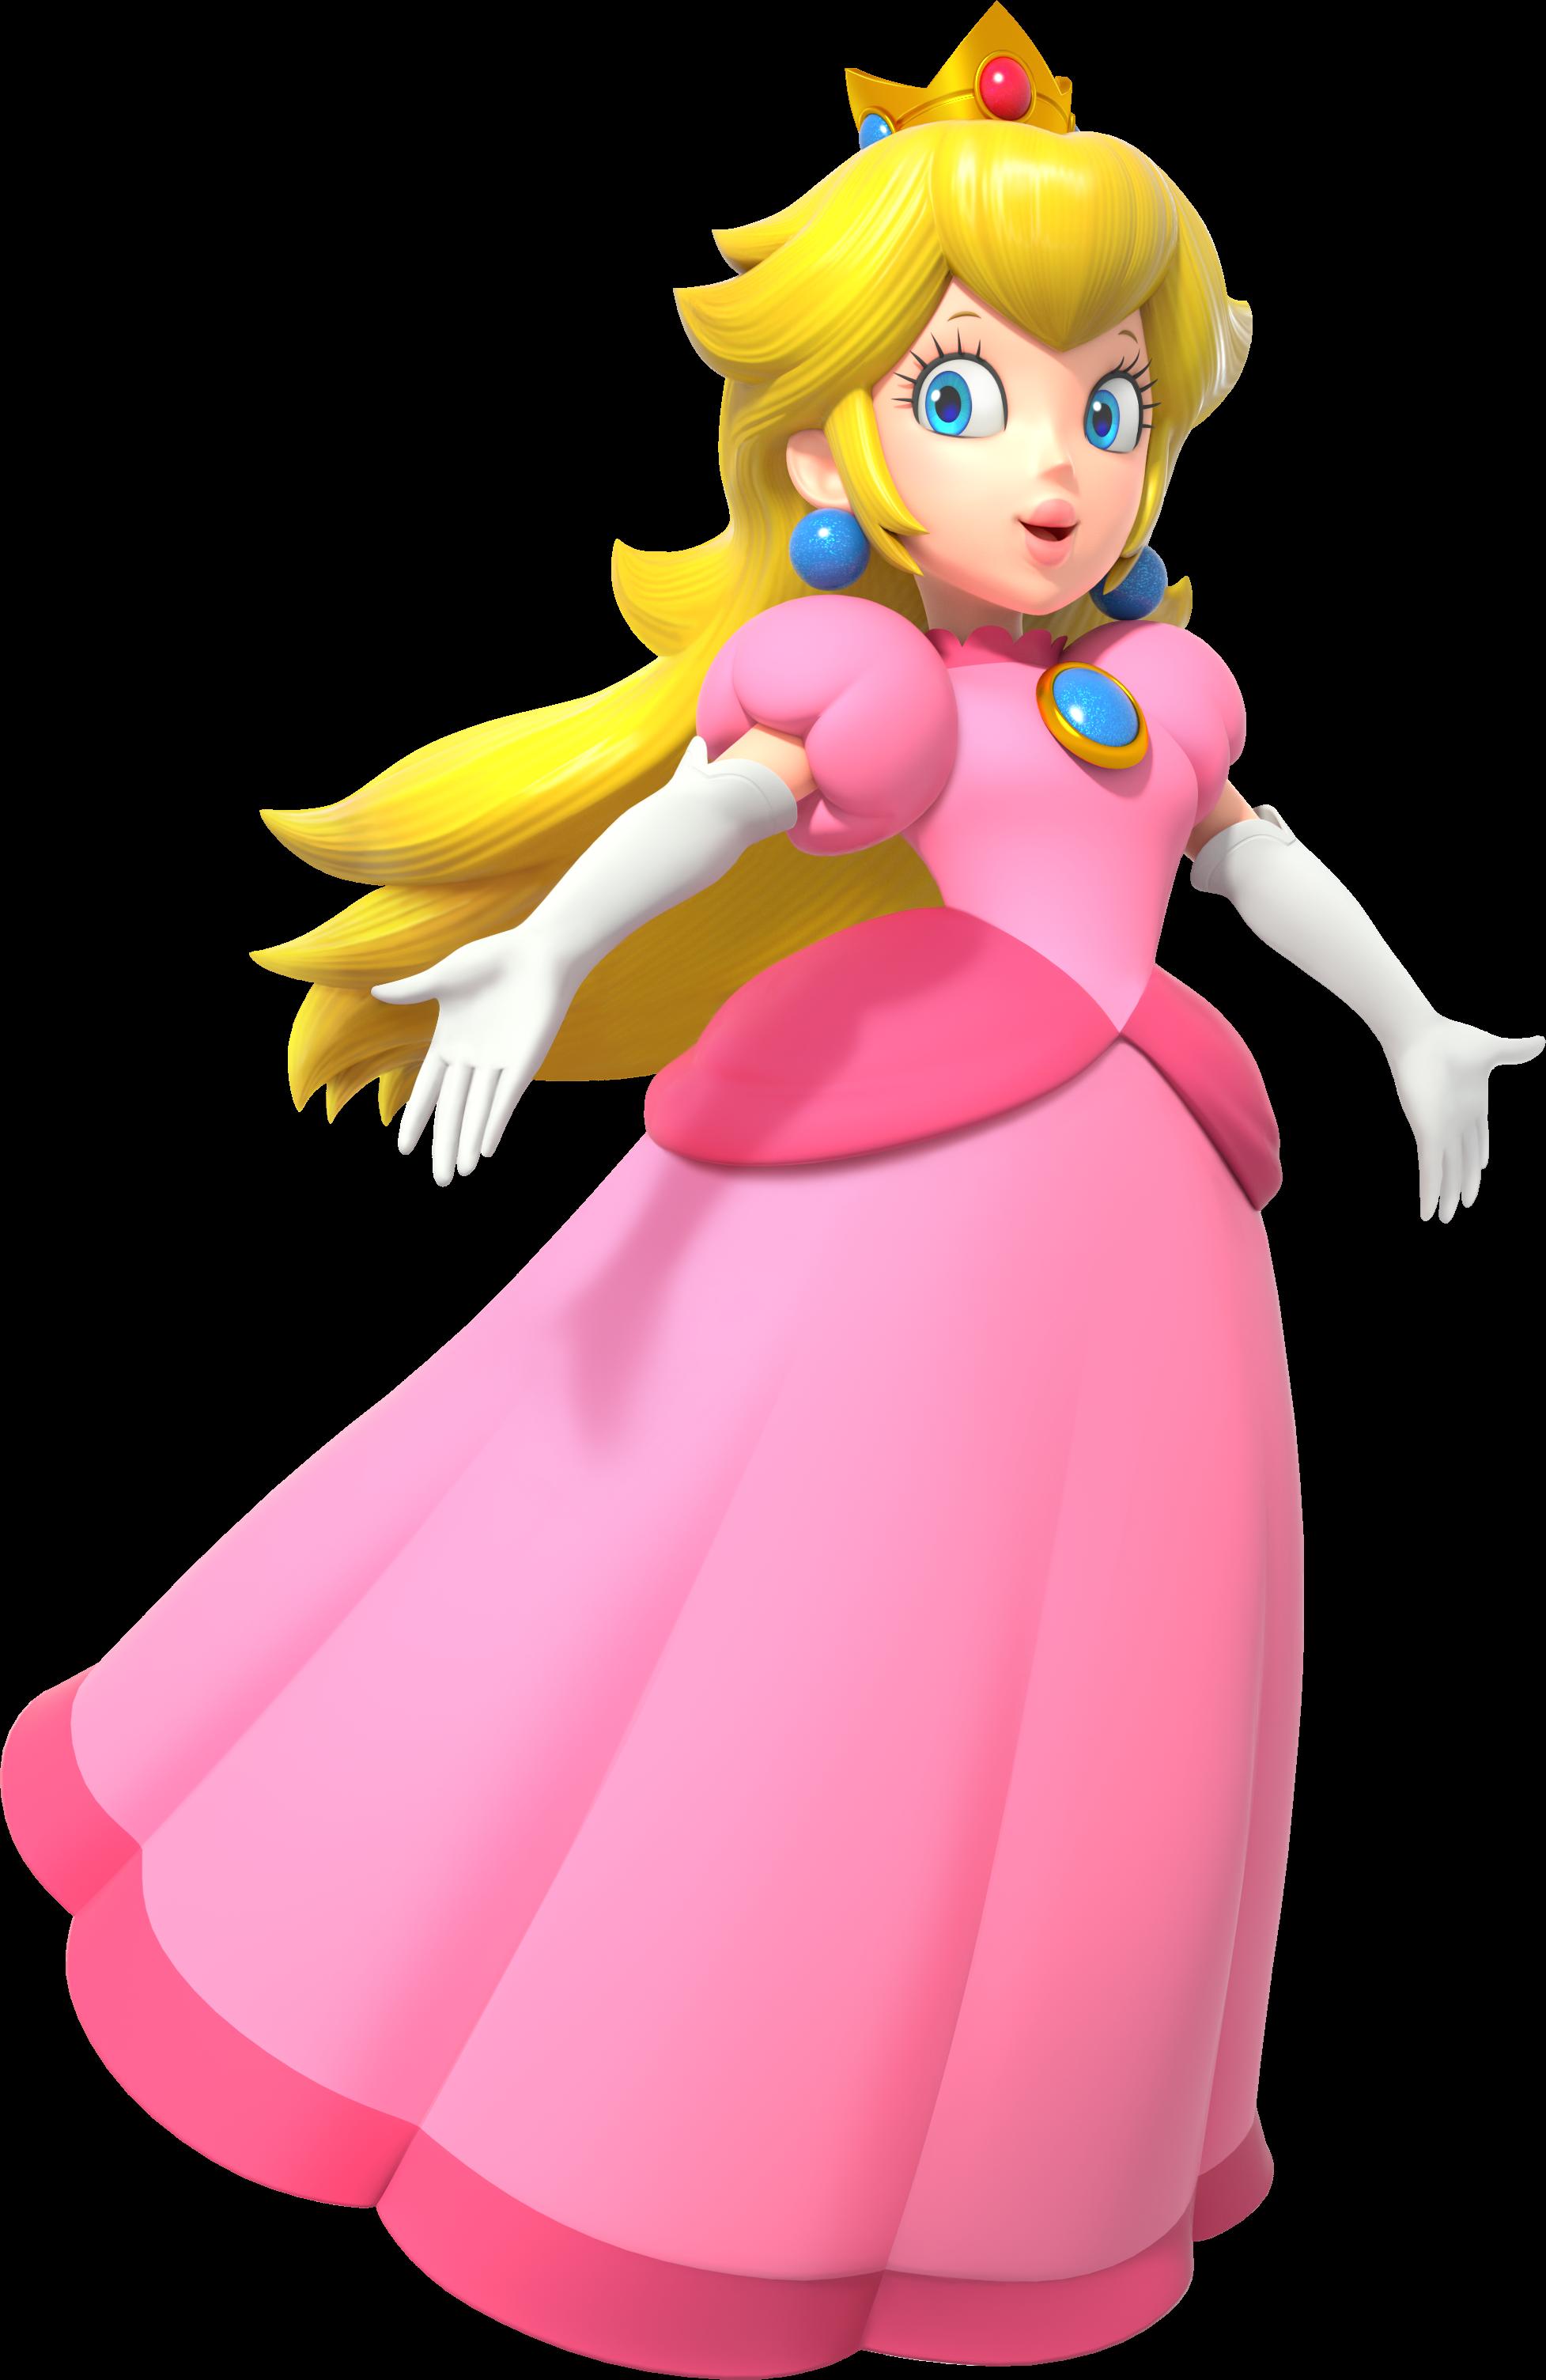 Paper Mario Princess Peach S Room